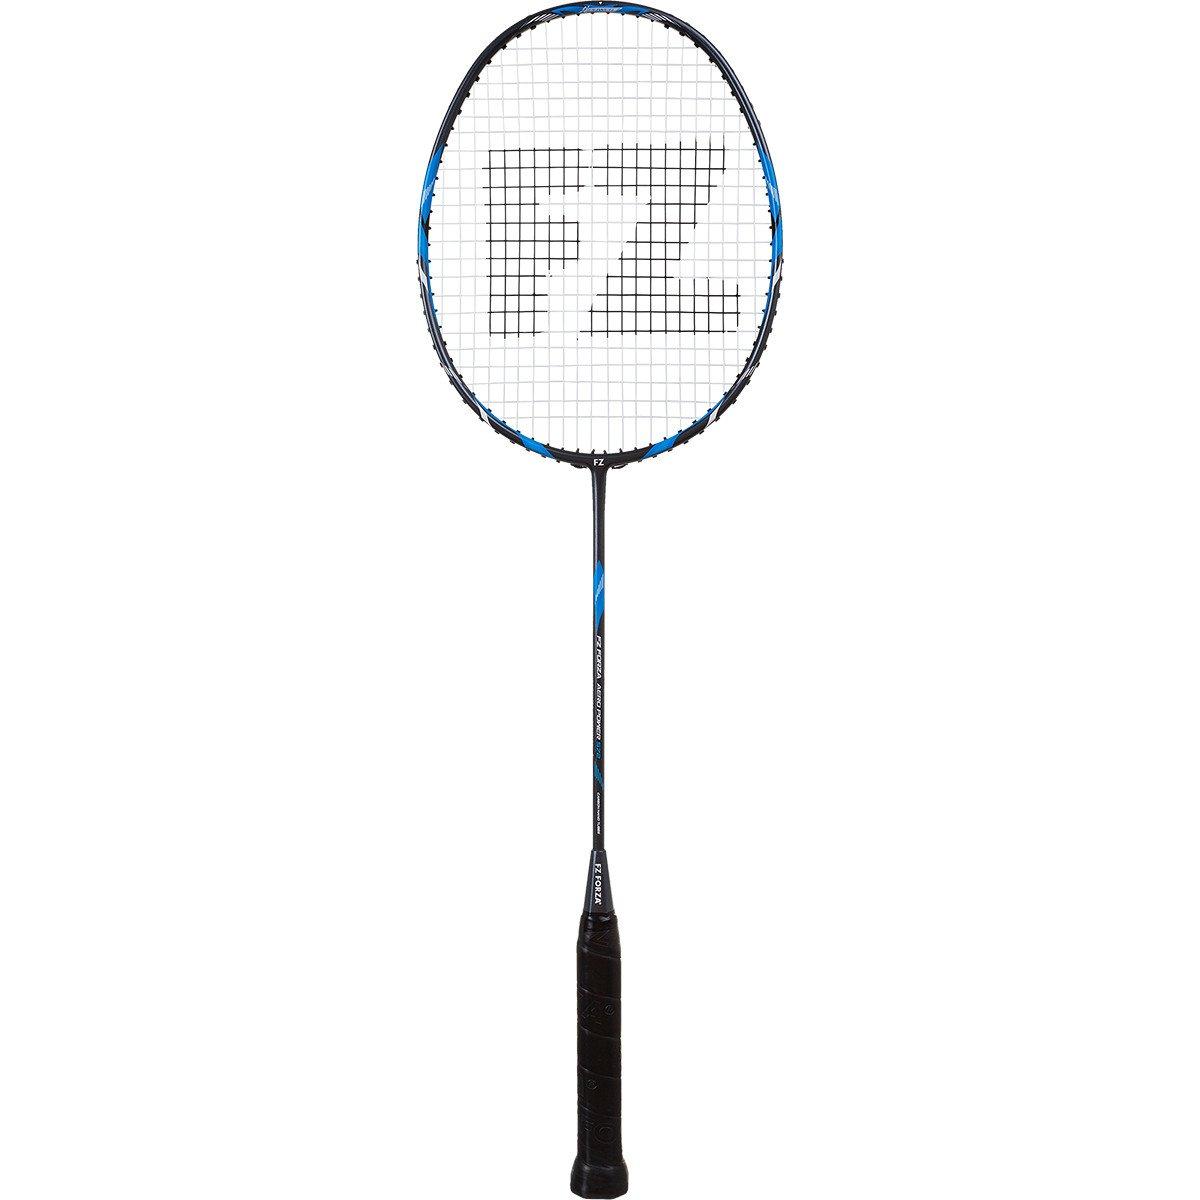 FZ FORZA Aero Power 572 Badmintonketcher